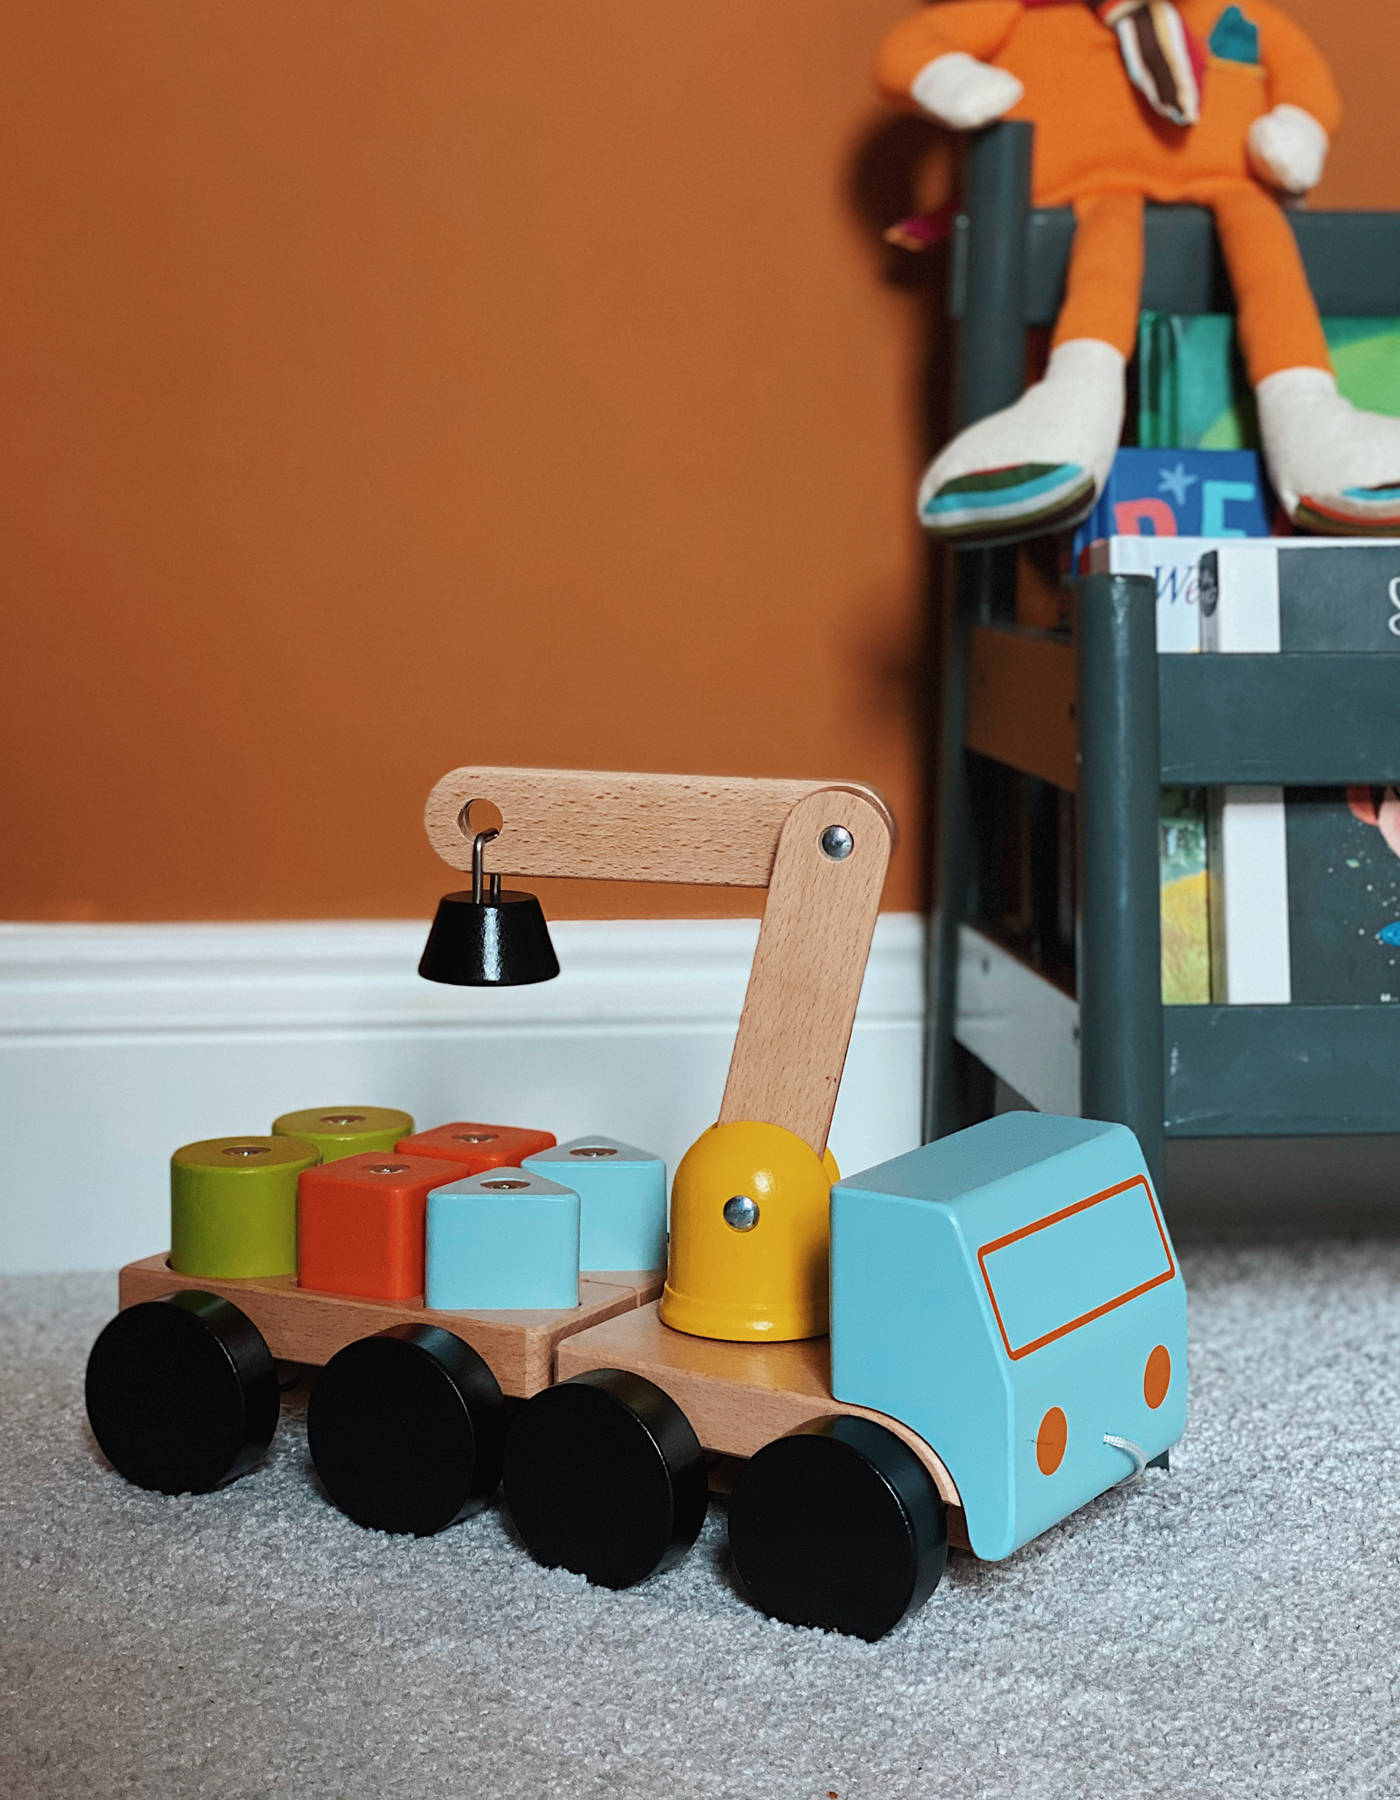 IKEA children's toys